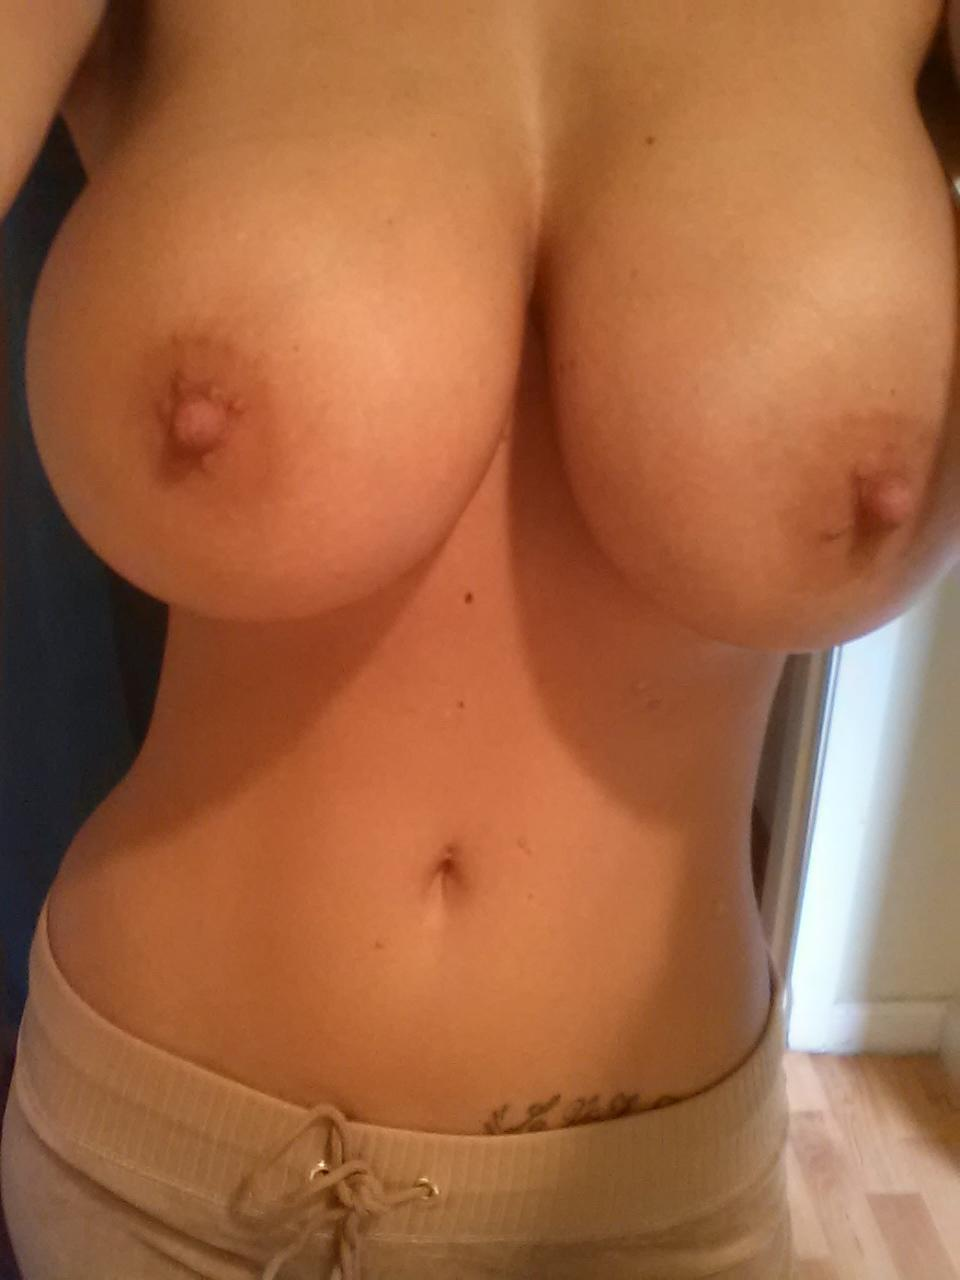 Фото голой груди 3 го размера